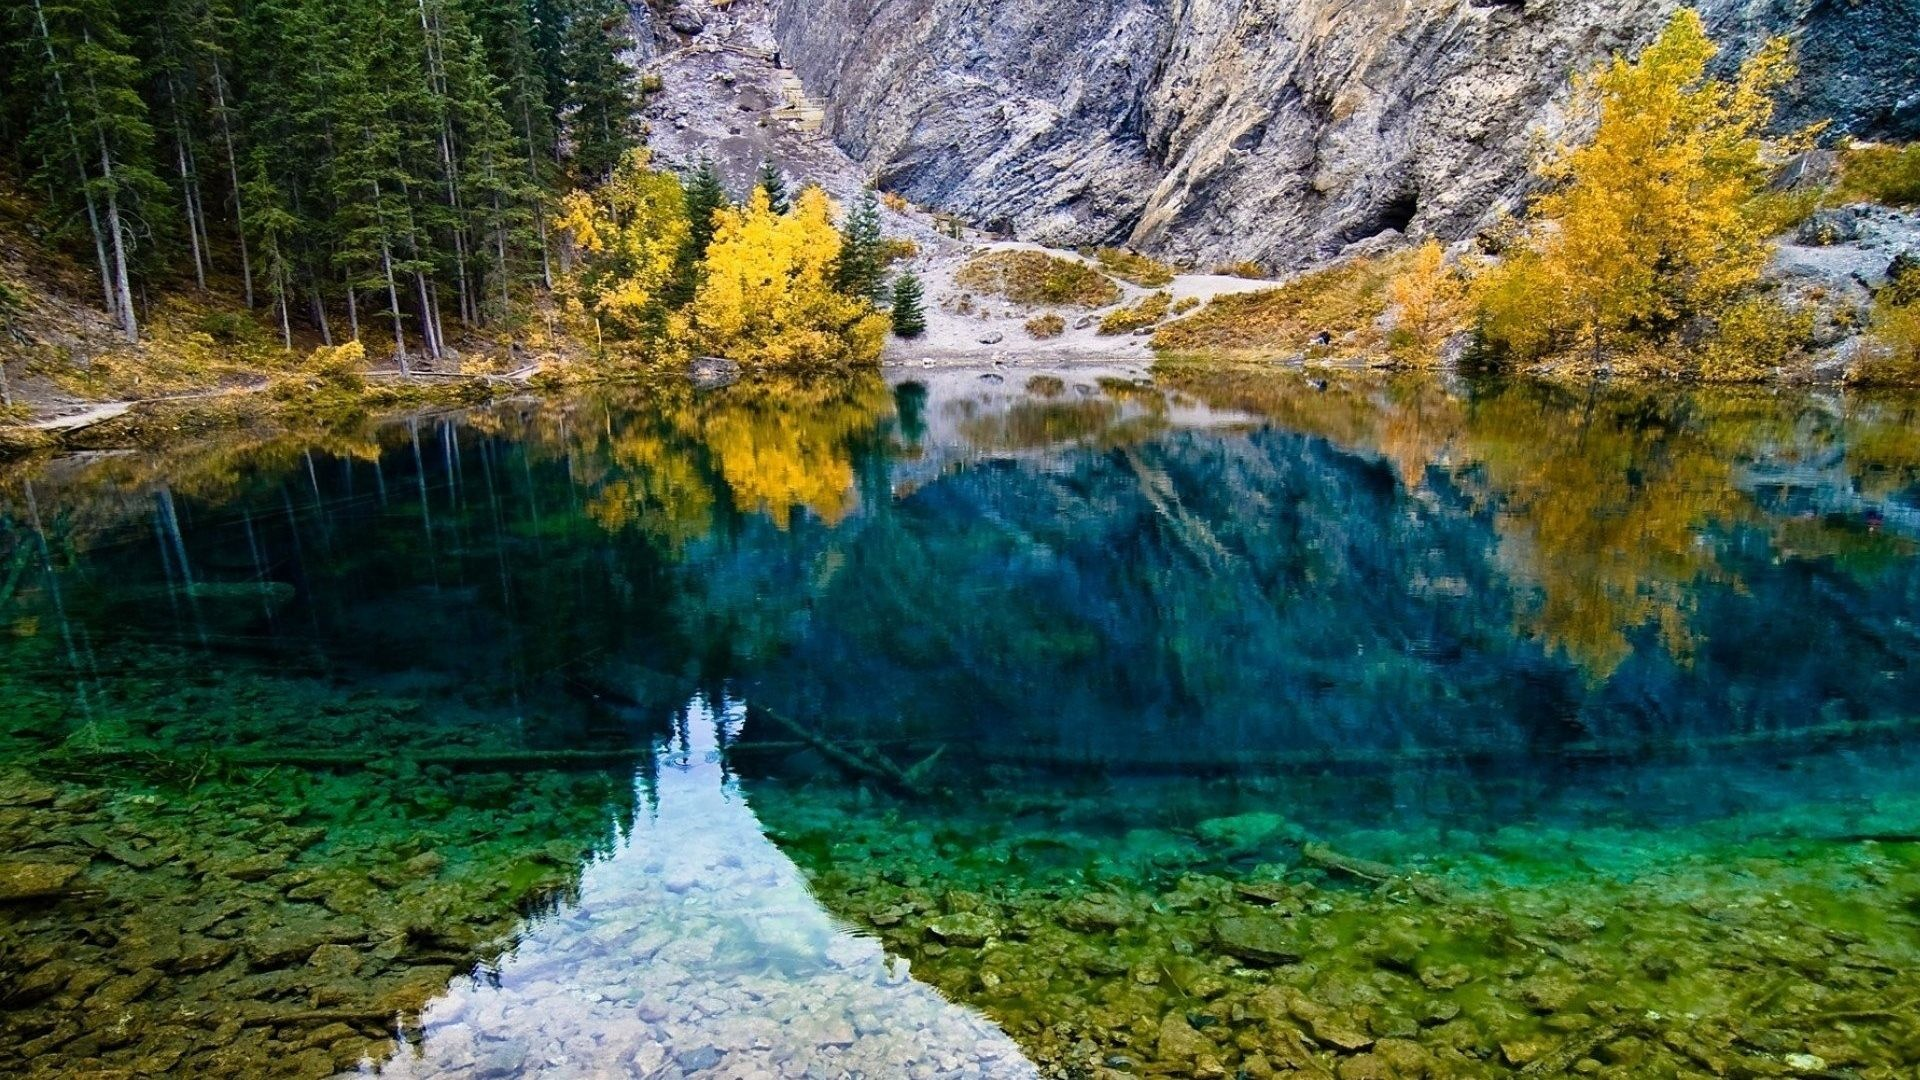 Beautiful Fall Paintings Wallpapers Hd Fall Mountain Wallpaper 41 Images